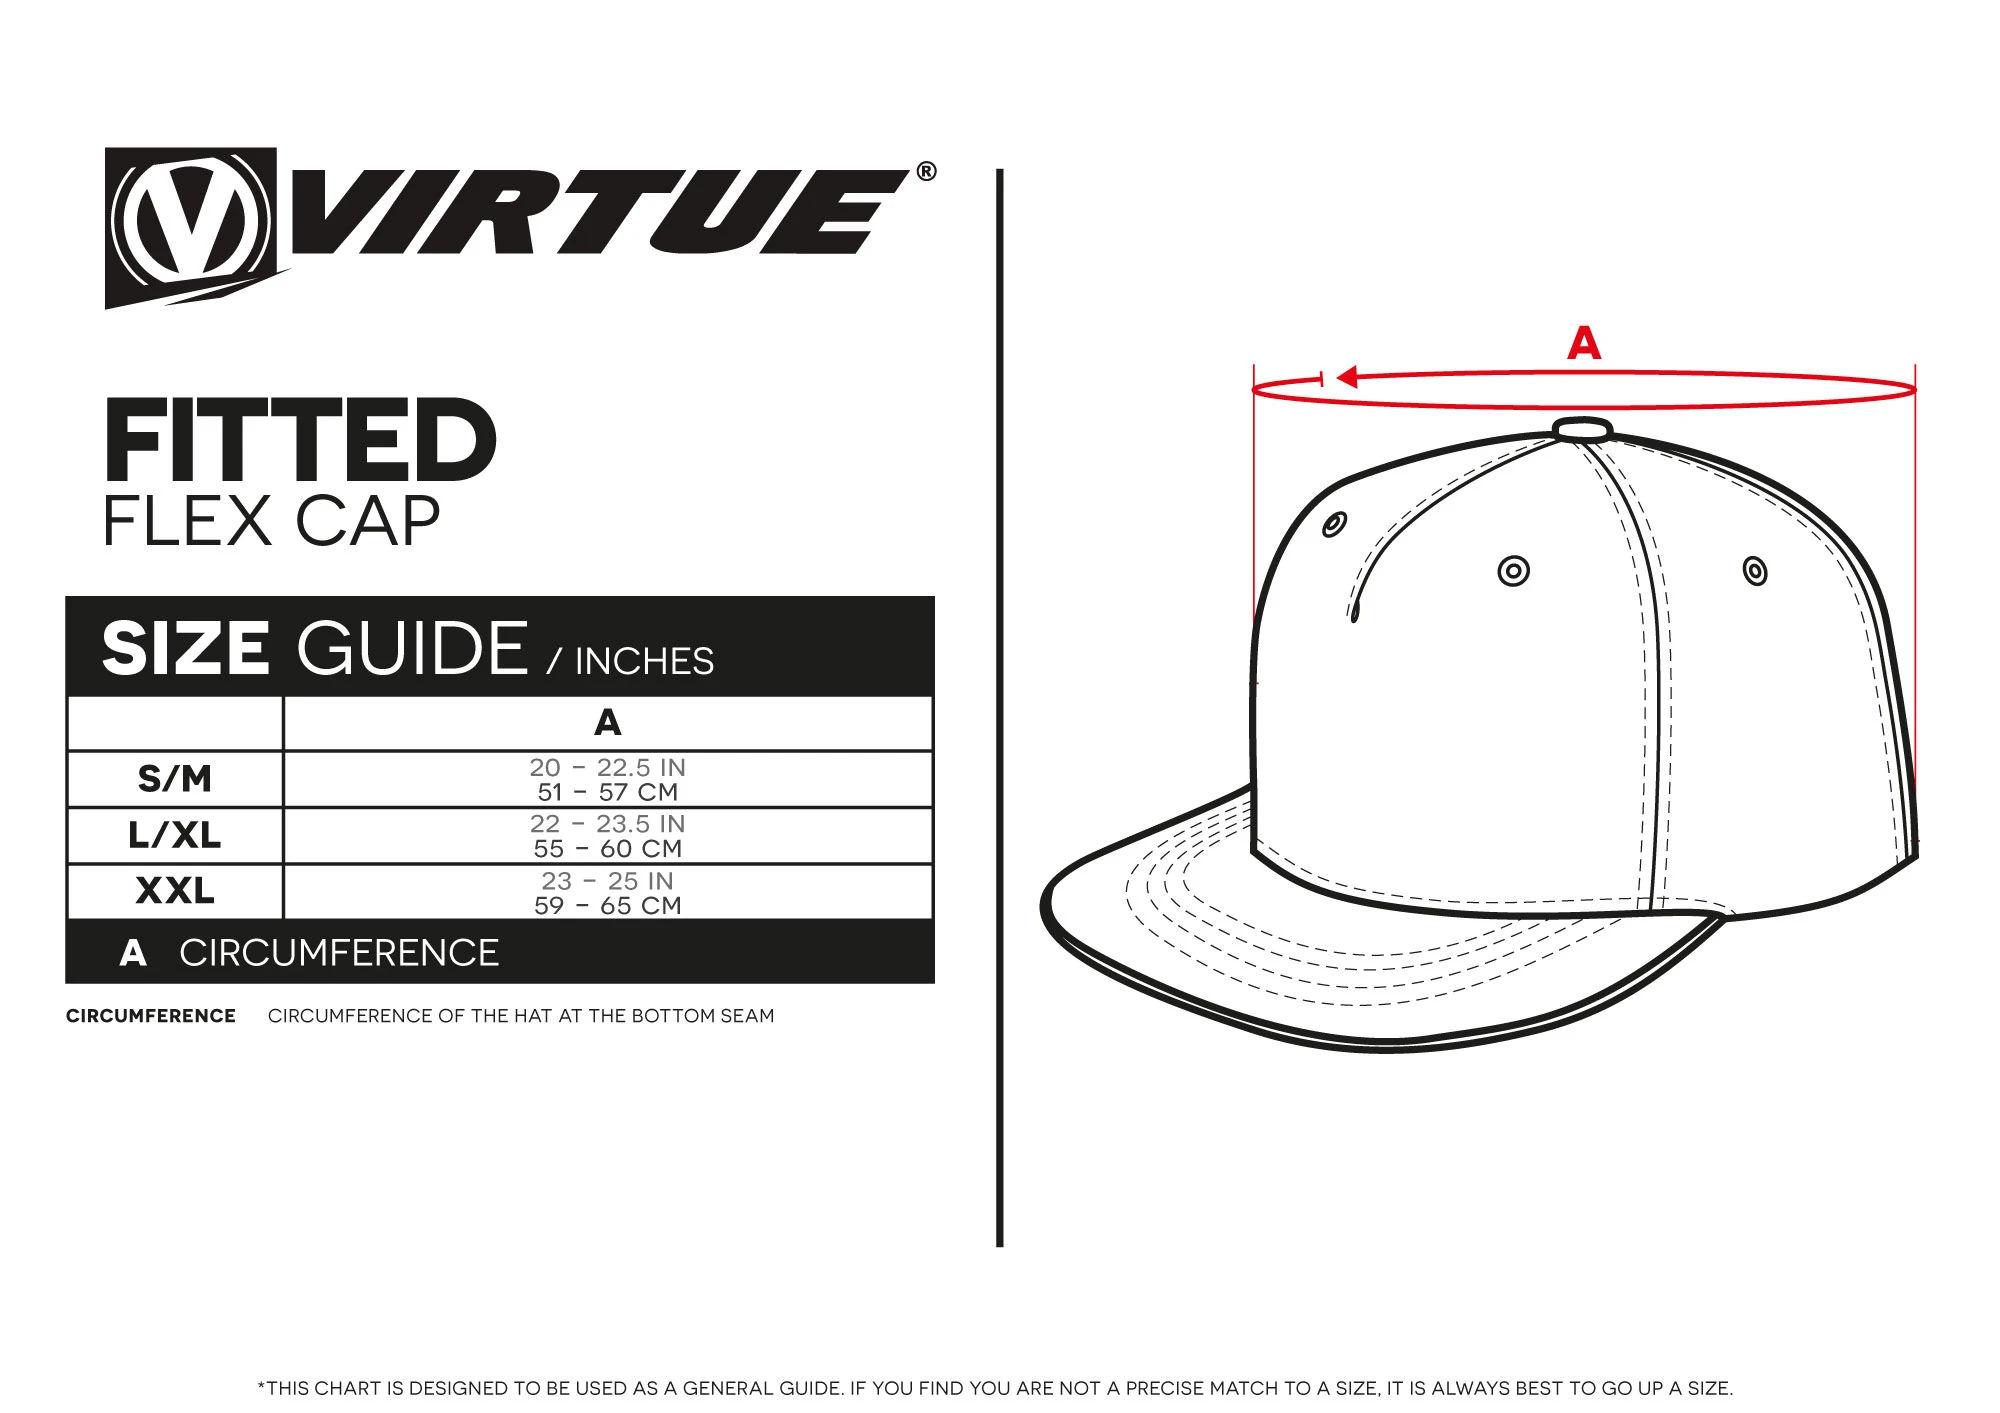 Virtue Fitted Flex Cap